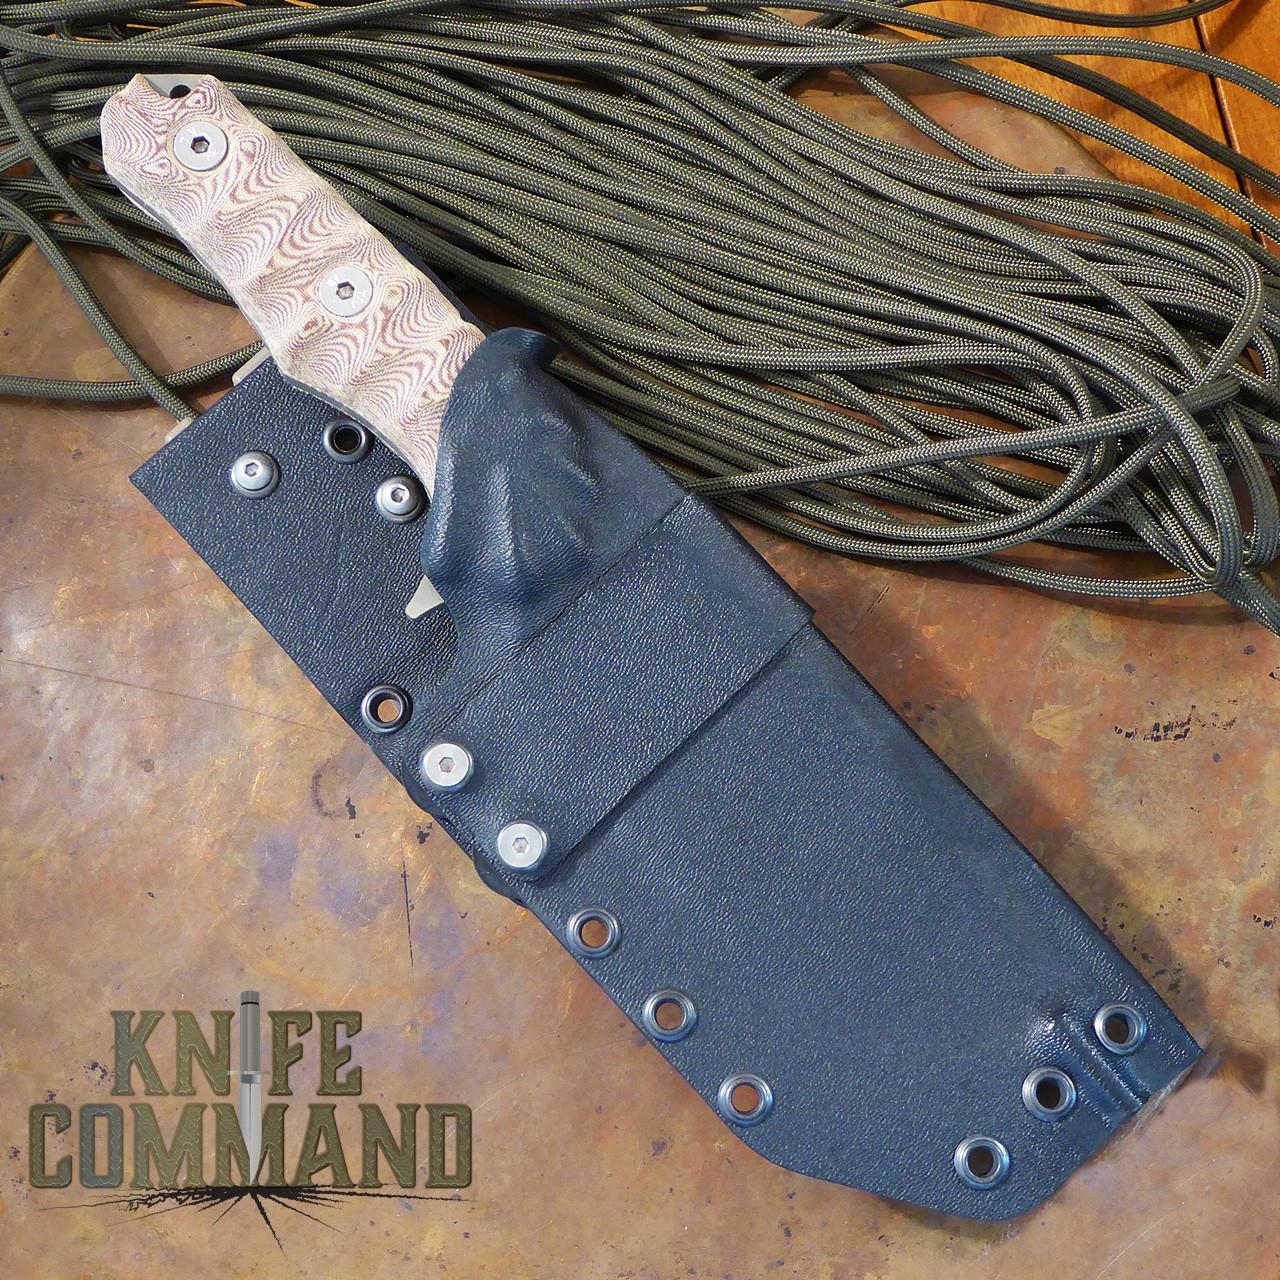 Wander Tactical Lynx Survival Knife Fire Micarta Dark Earth Gunkote.  Kydex sheath with belt adapter.